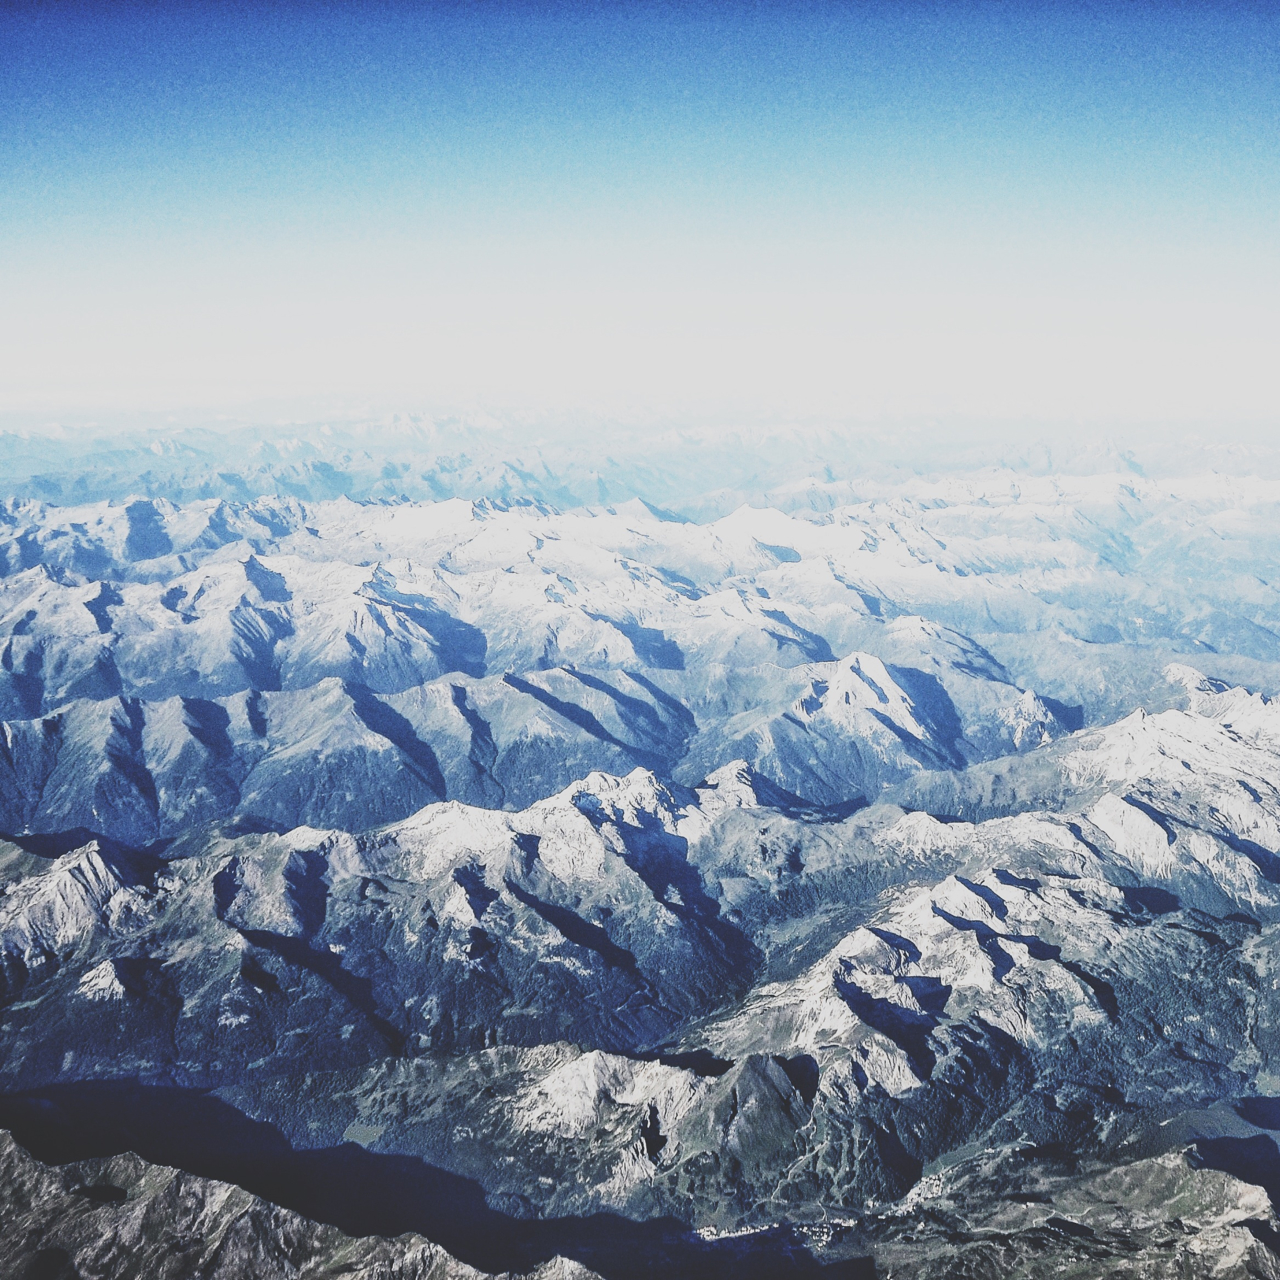 Somewhere over Europe